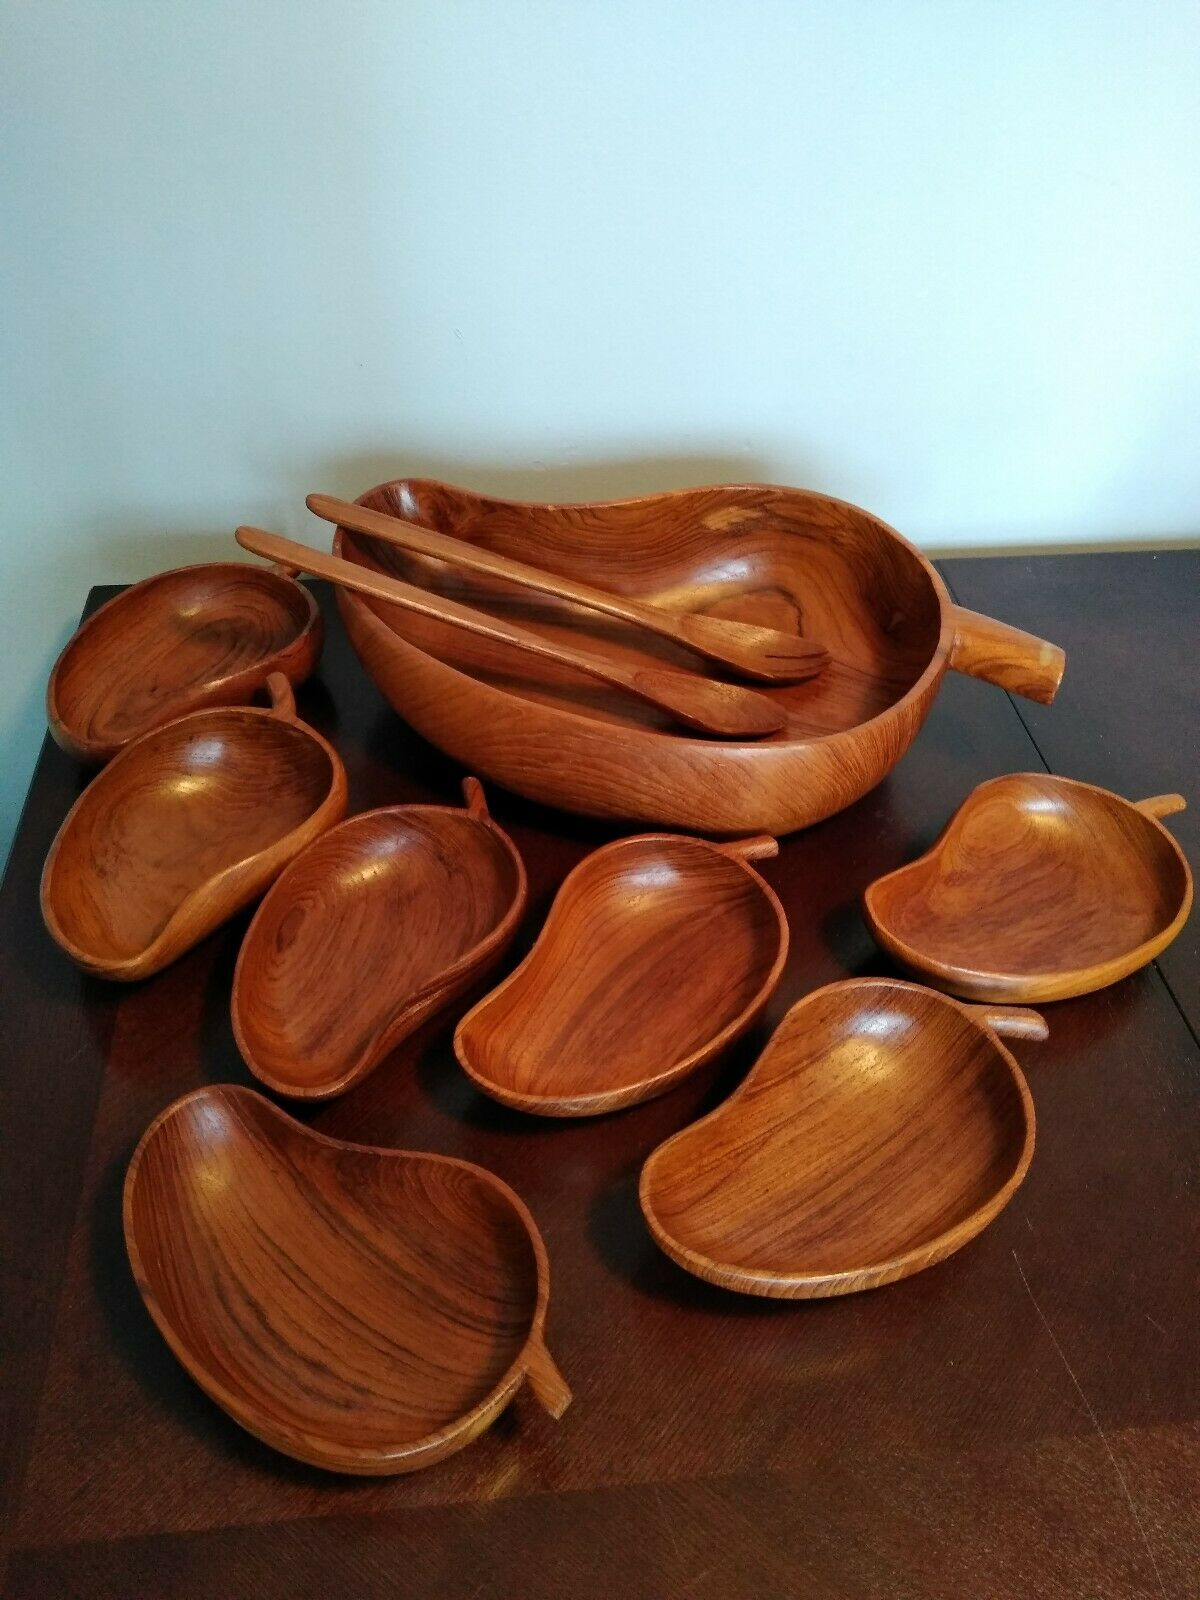 Vintage 10 Pc  Monkey Pod Wood Salad Bowl Serving Set Mid Century Modern